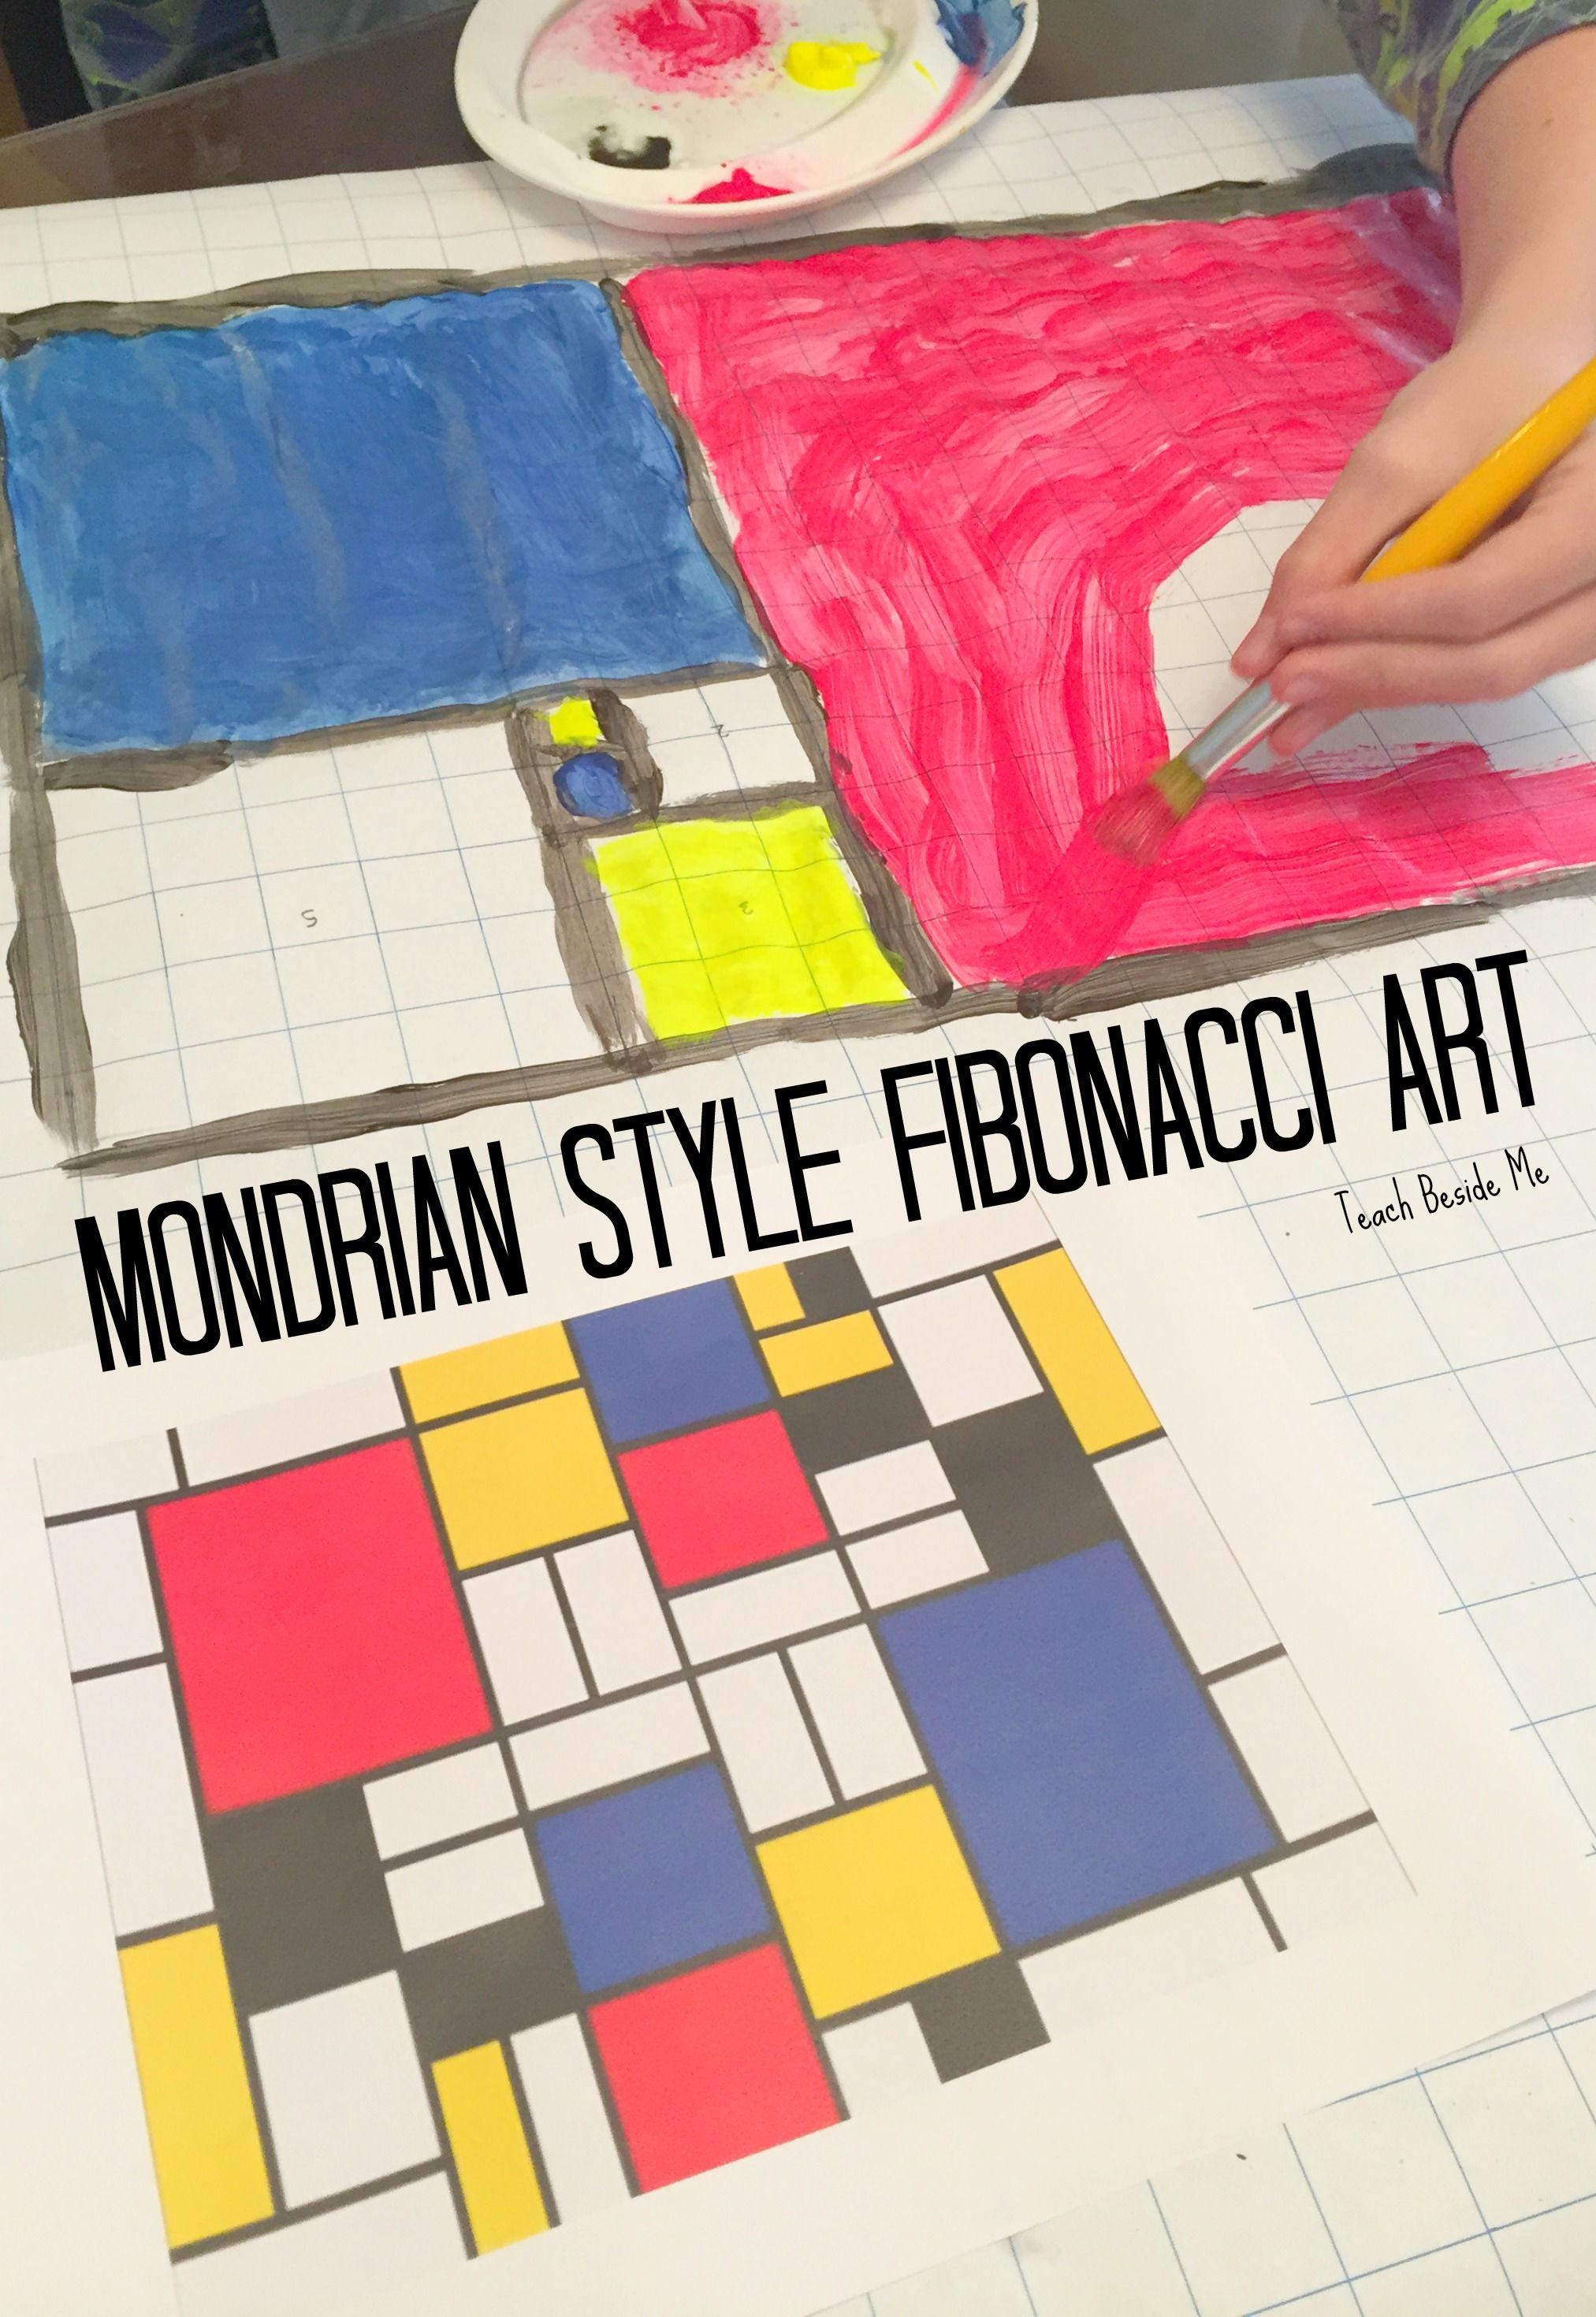 Mondrian Style Fibonacci Art